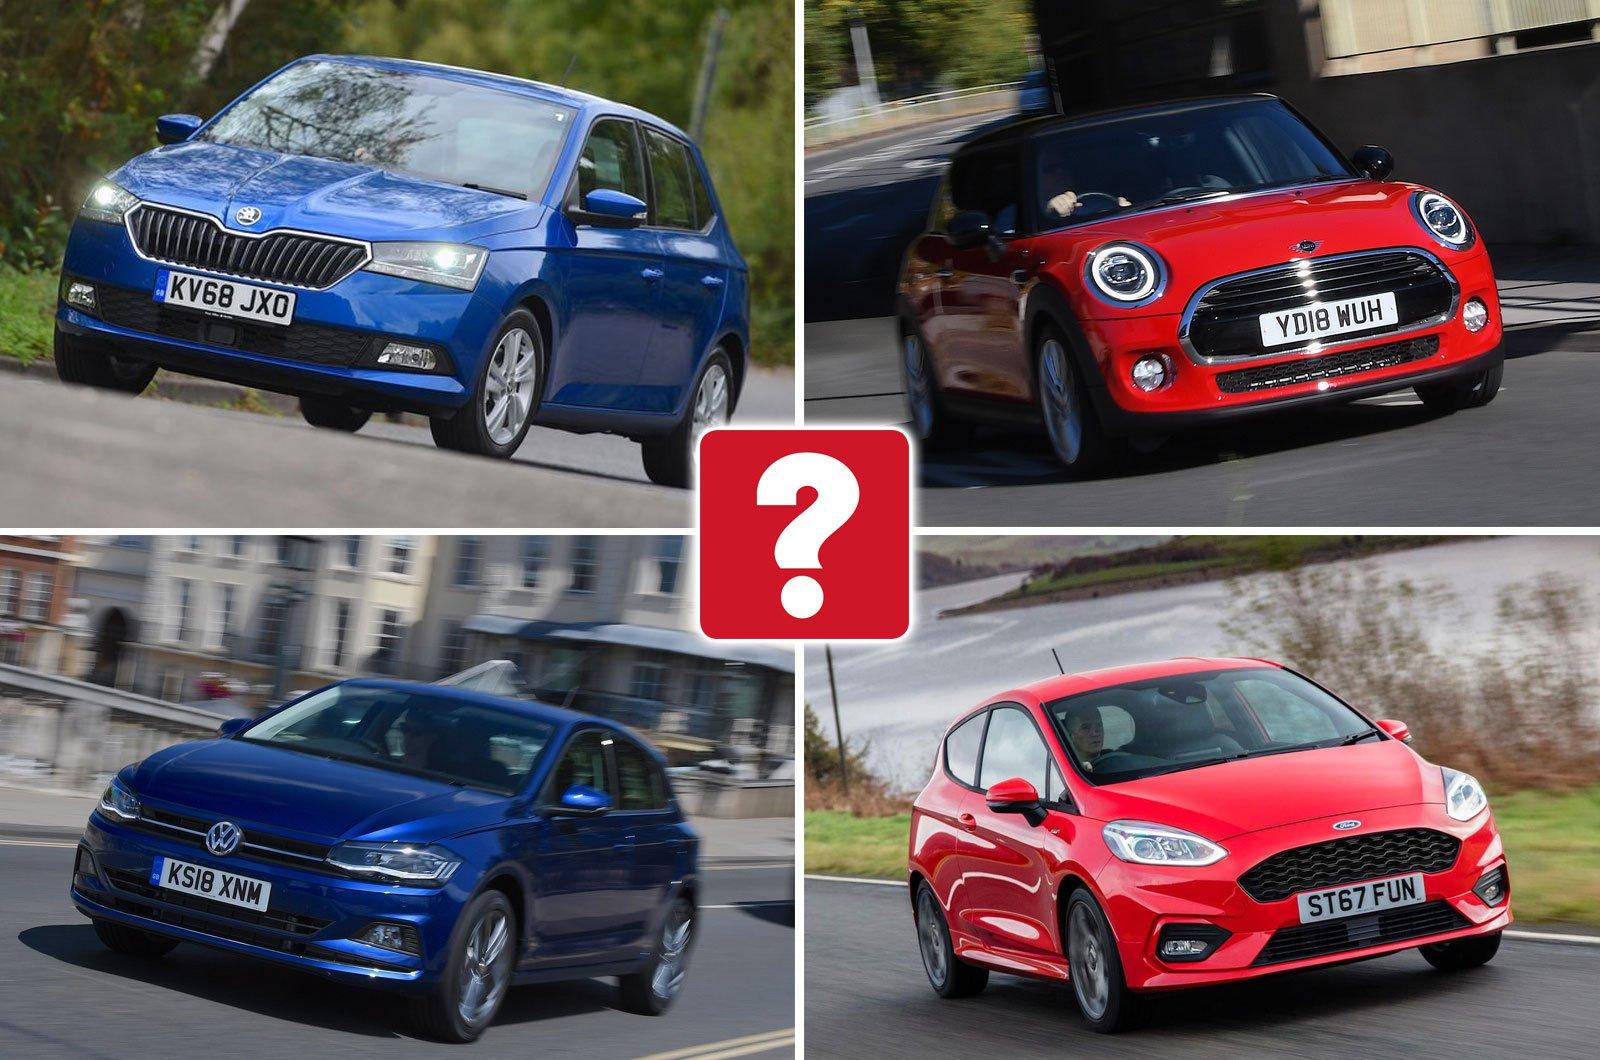 Skoda Fabia, Mini hatchback, Volkswagen Polo, Ford Fiesta